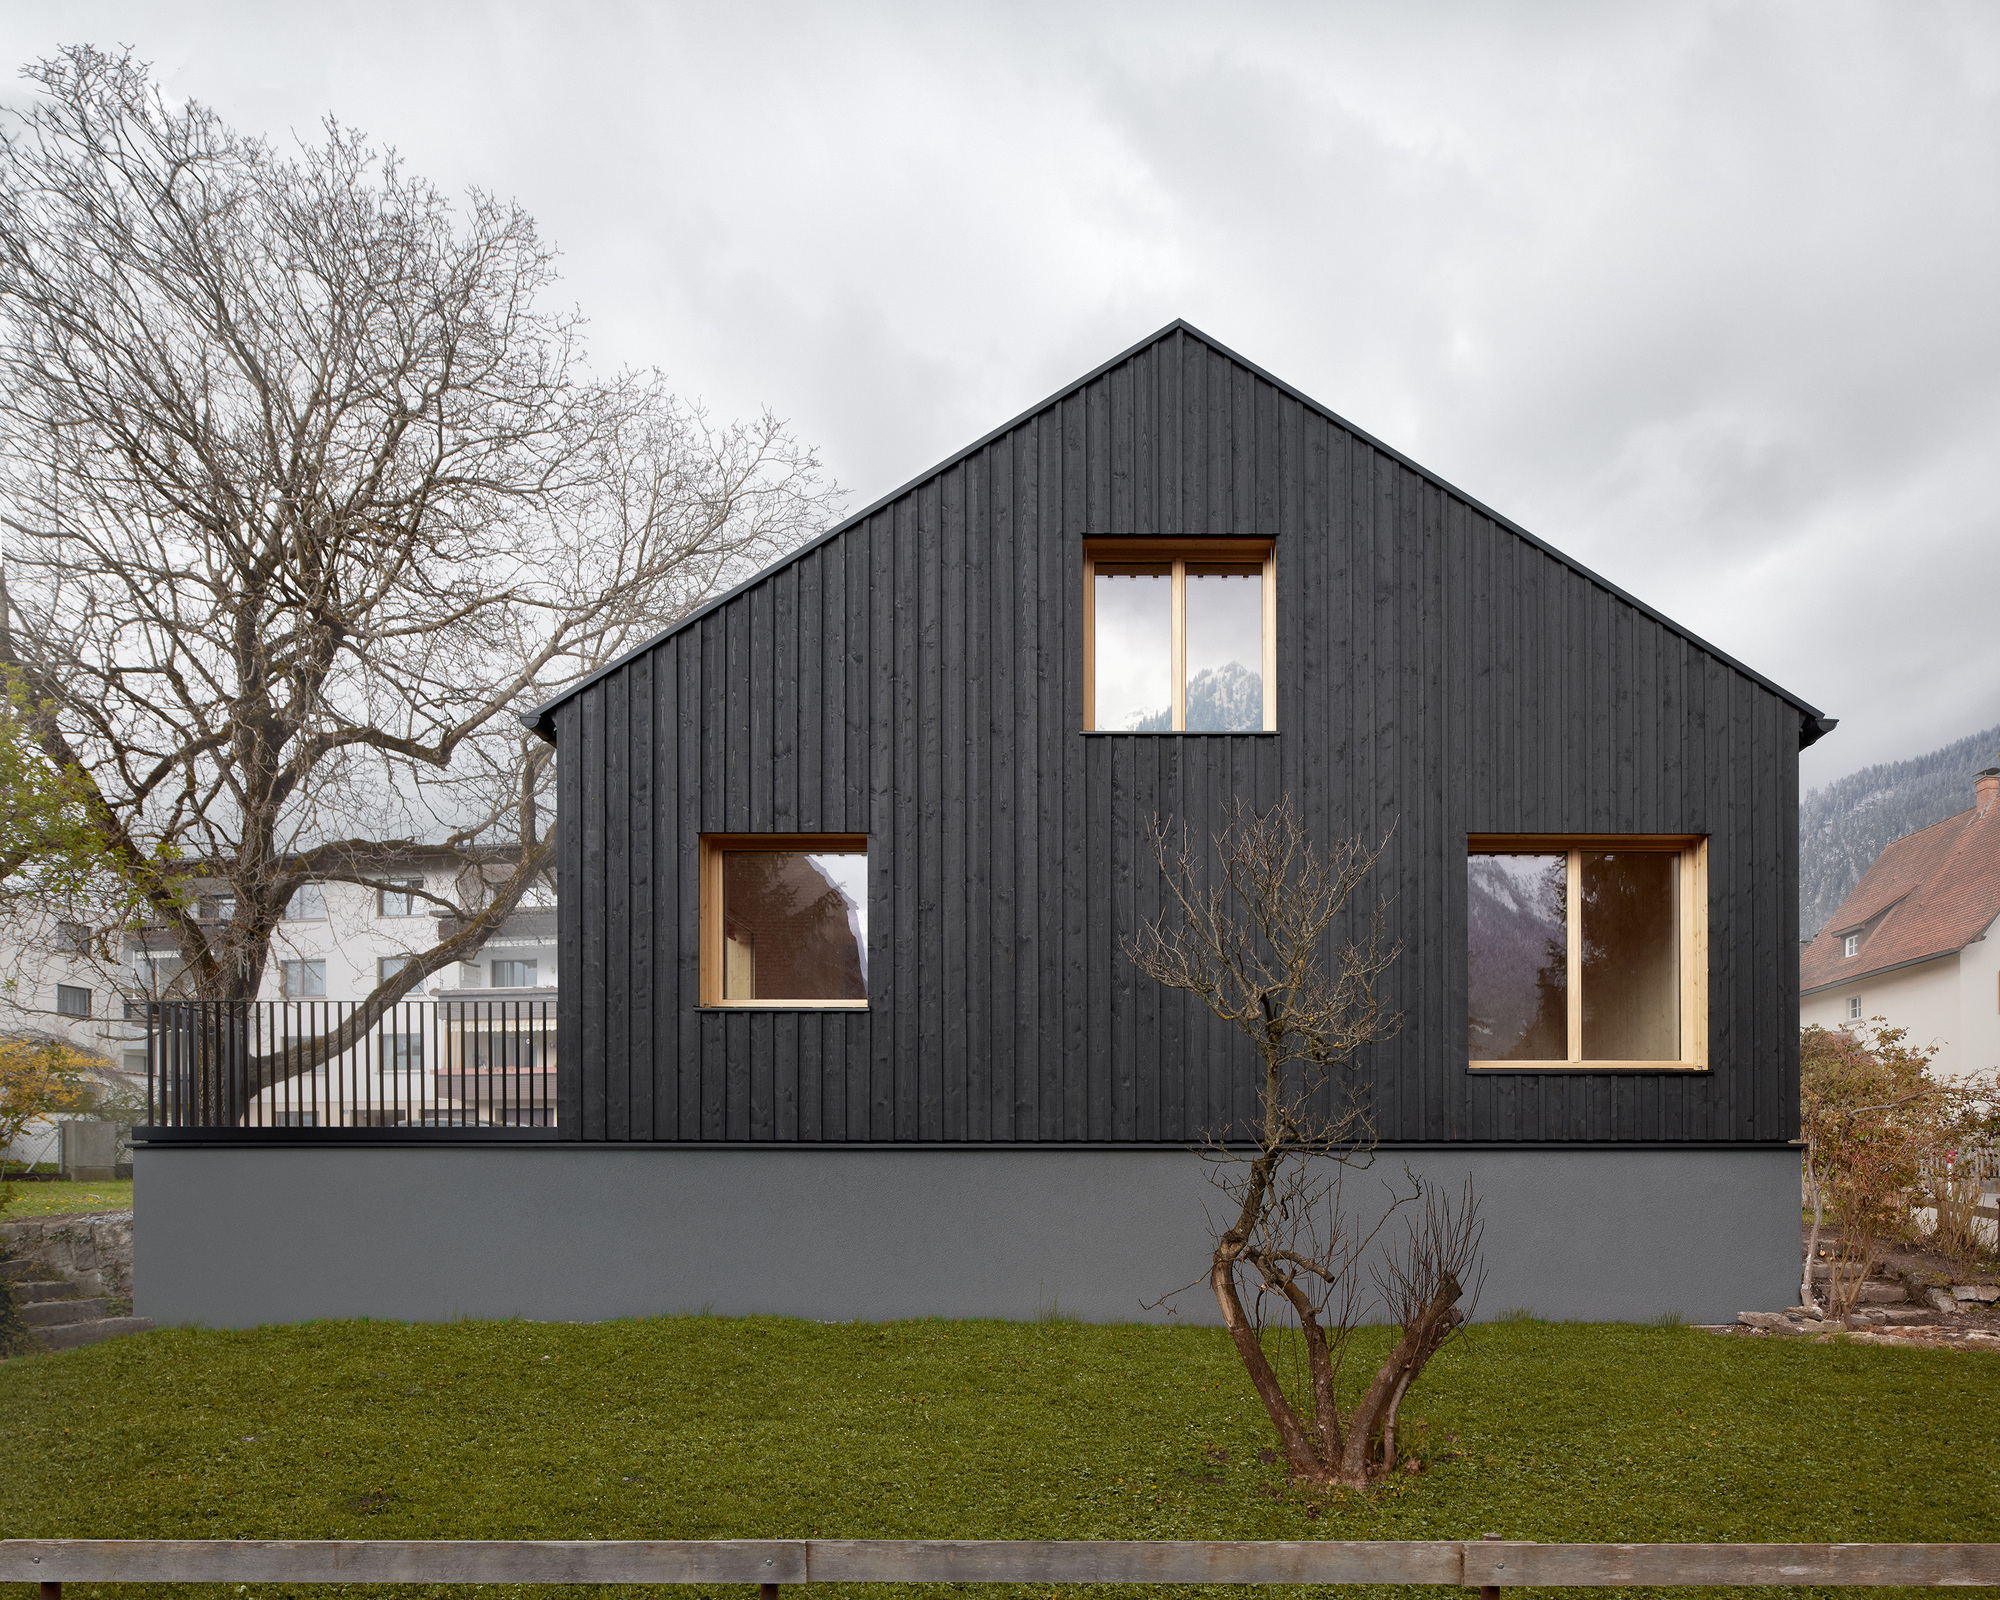 House Mad of Spruce / MWArchitekten